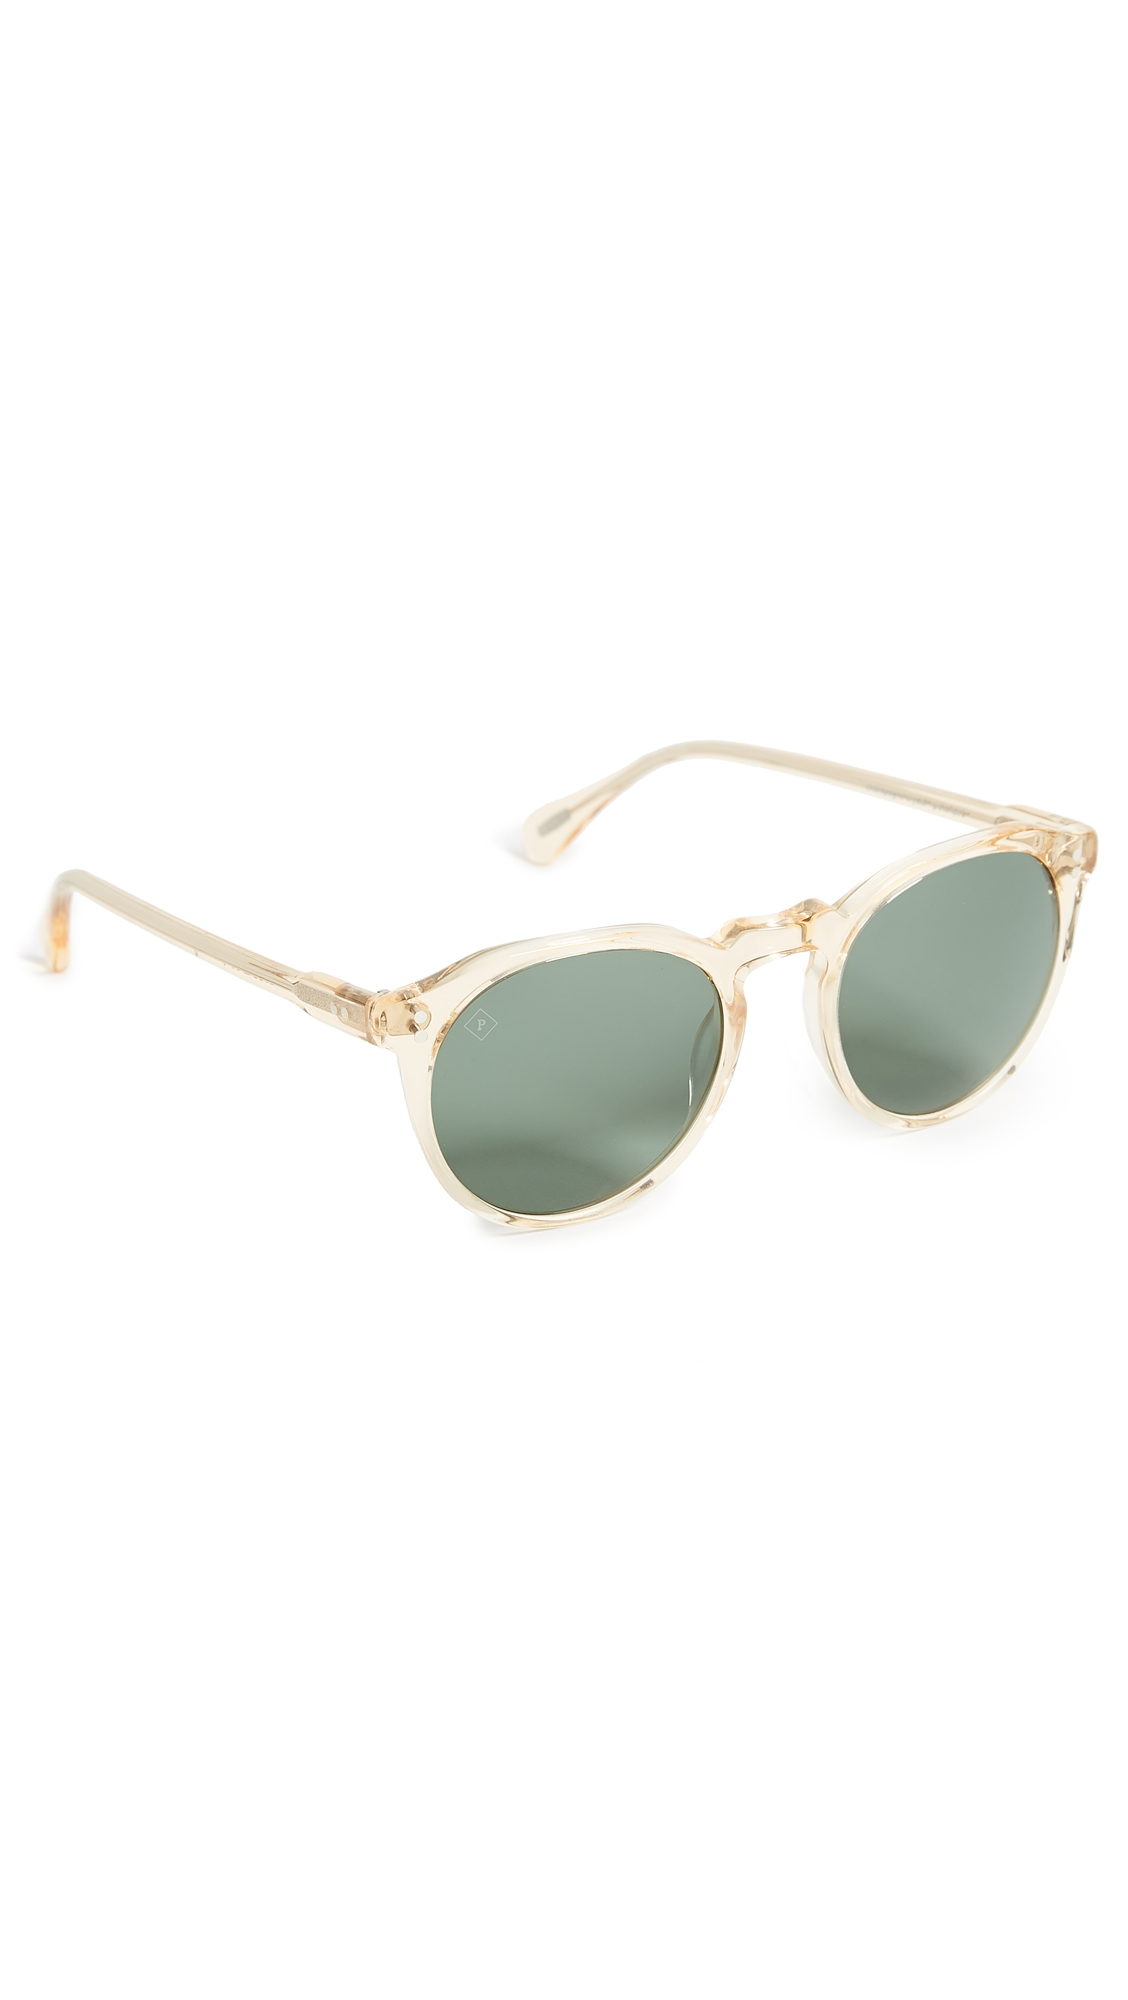 037768e9260 Raen Remmy 49 Sunglasses In Champagne Crystal Green Polari ...